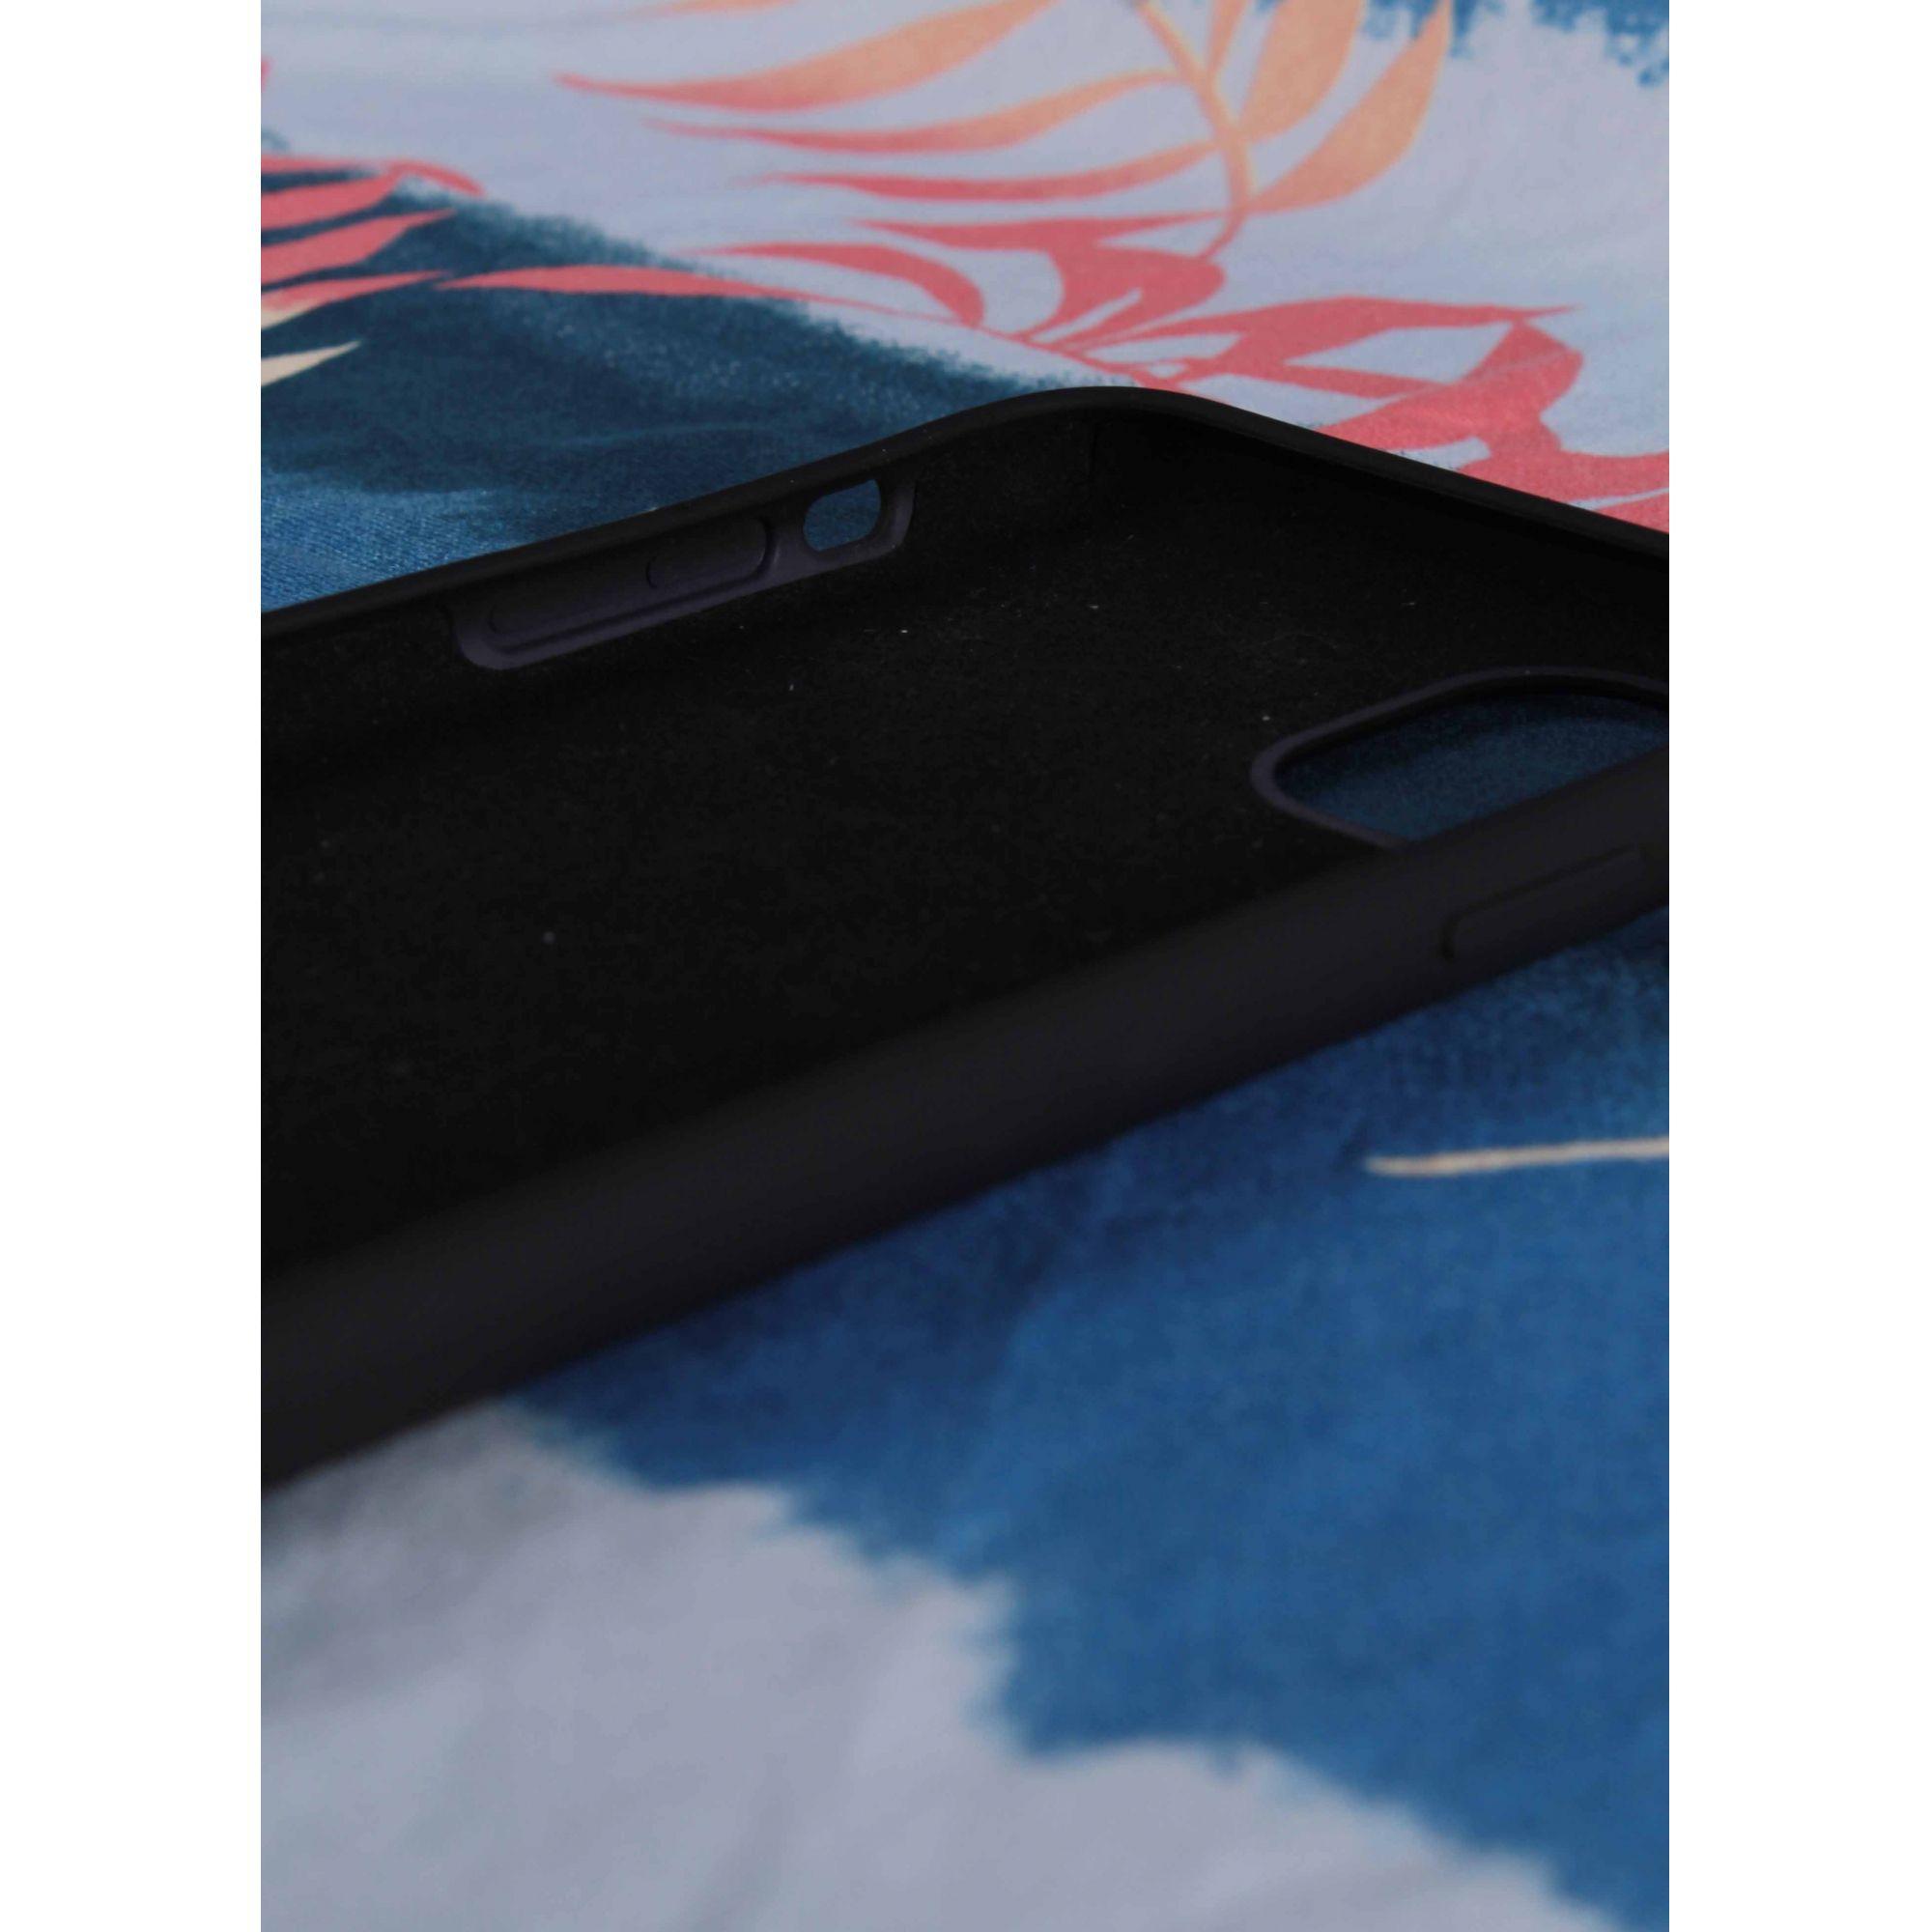 Capinha para Iphone 11 Pro - MENINO&MENINA  - Menino_Menina